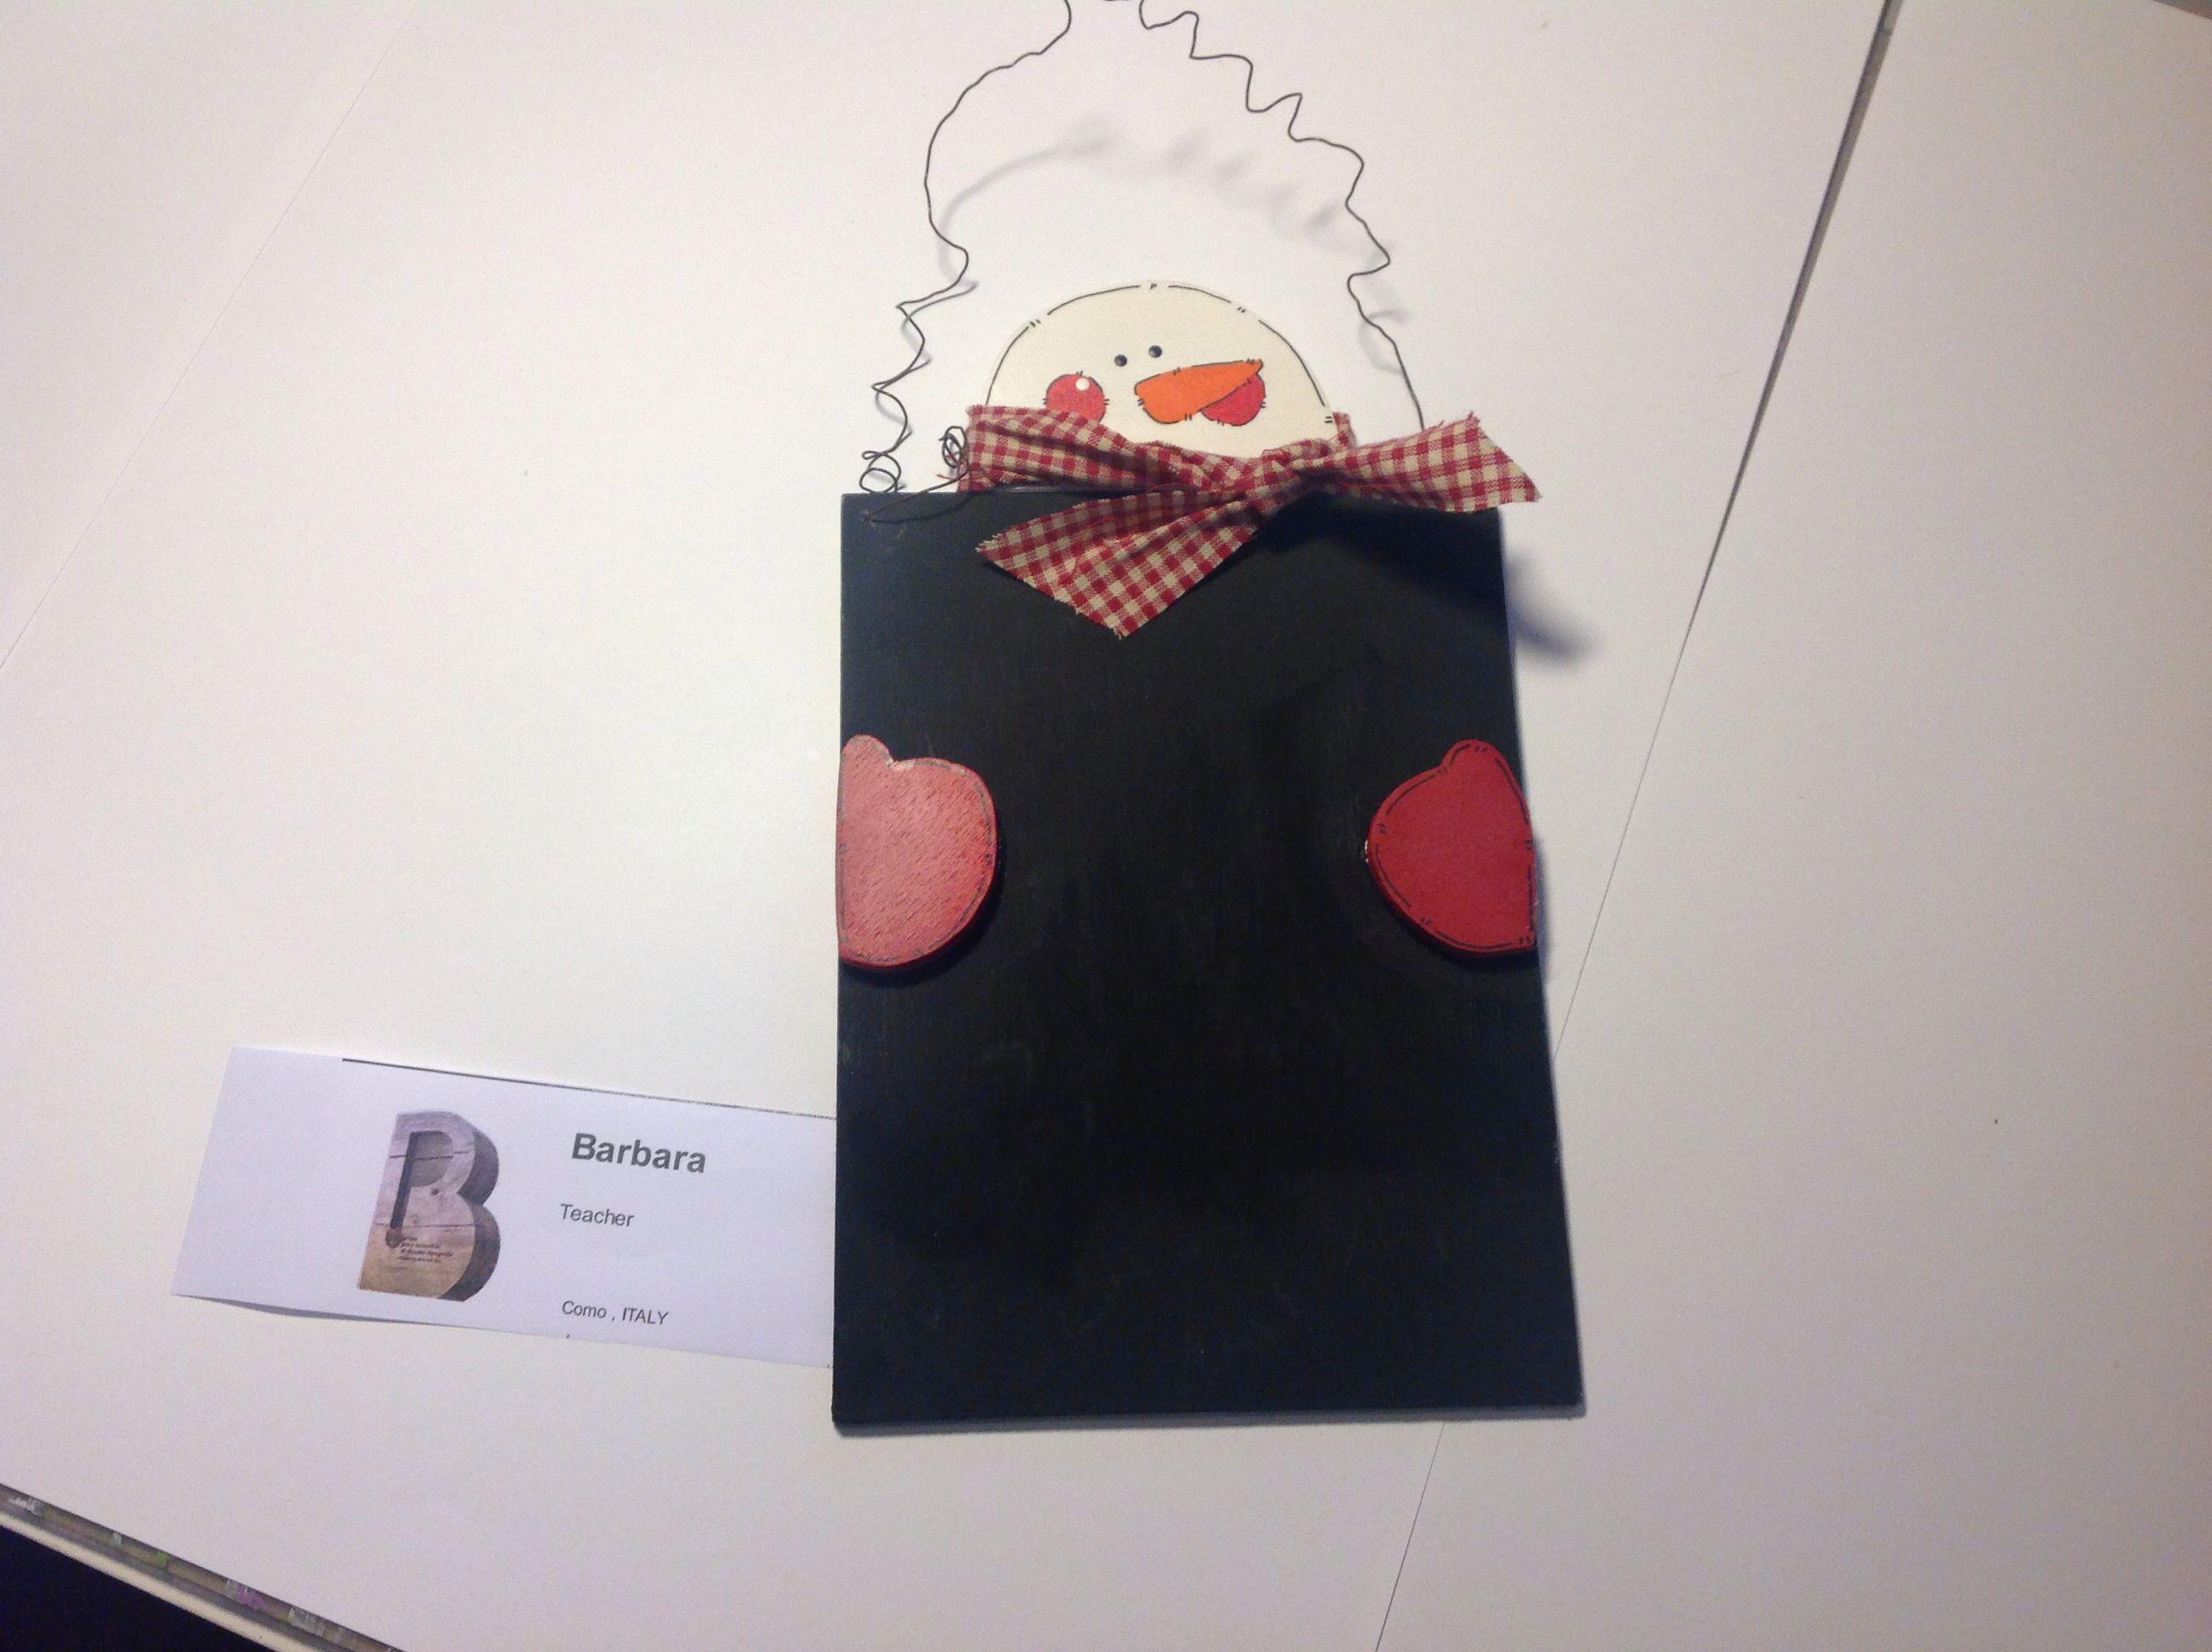 Bambini Pittura ~ Bambini mandala e pittura reggio emilia kids